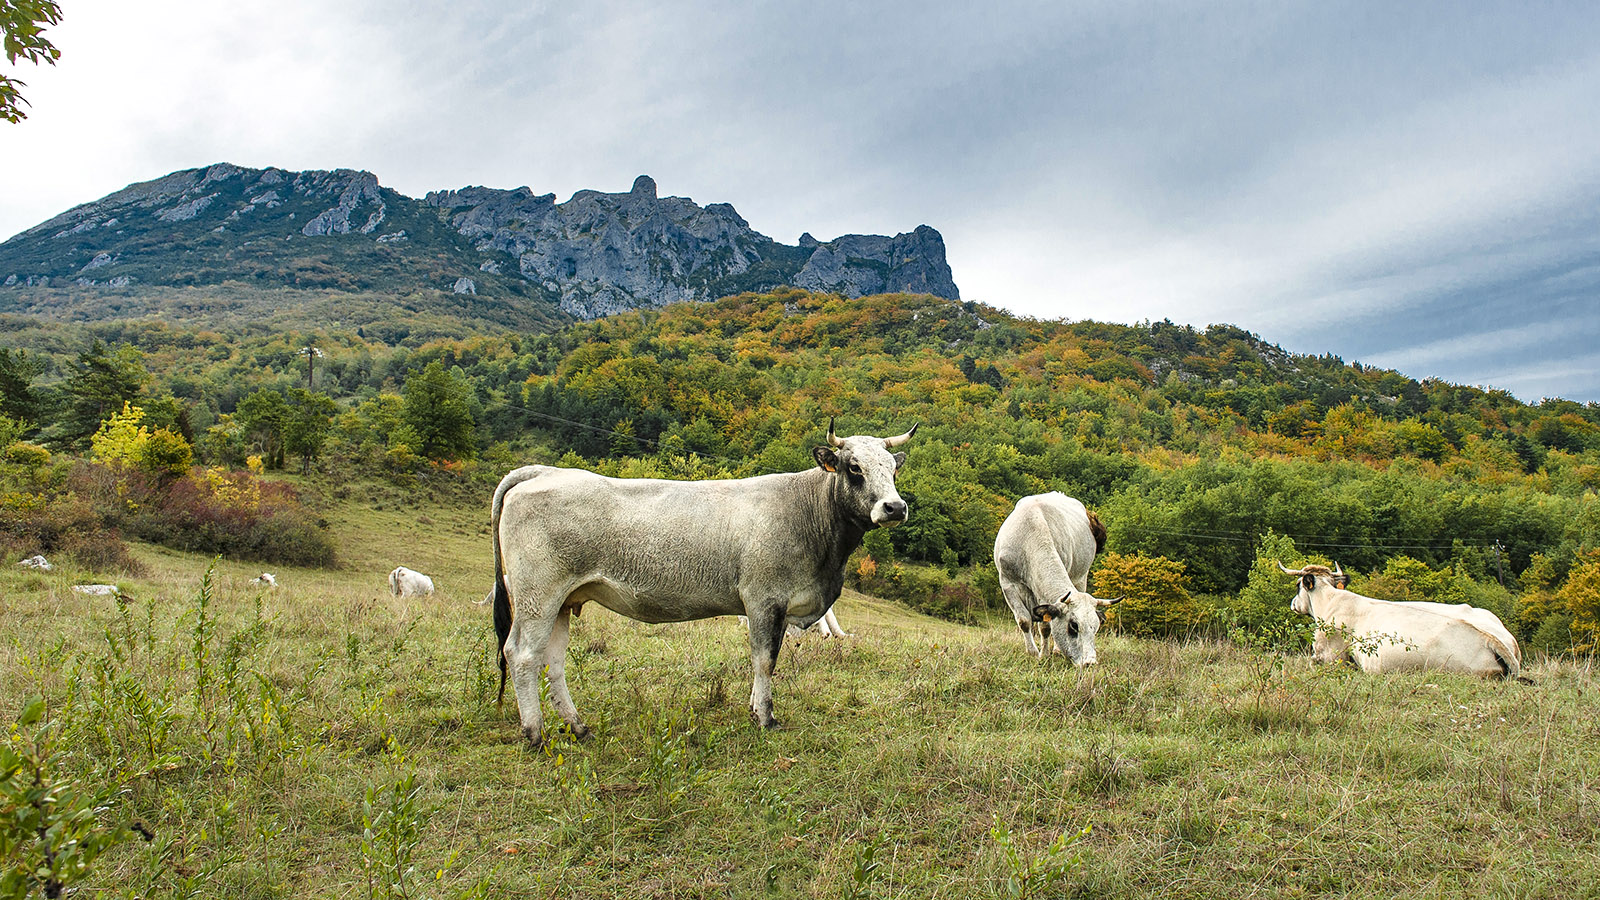 Bugarach: Kühe auf der Weide vor dem Pech de Bugarach. Foto: Hilke Maunder